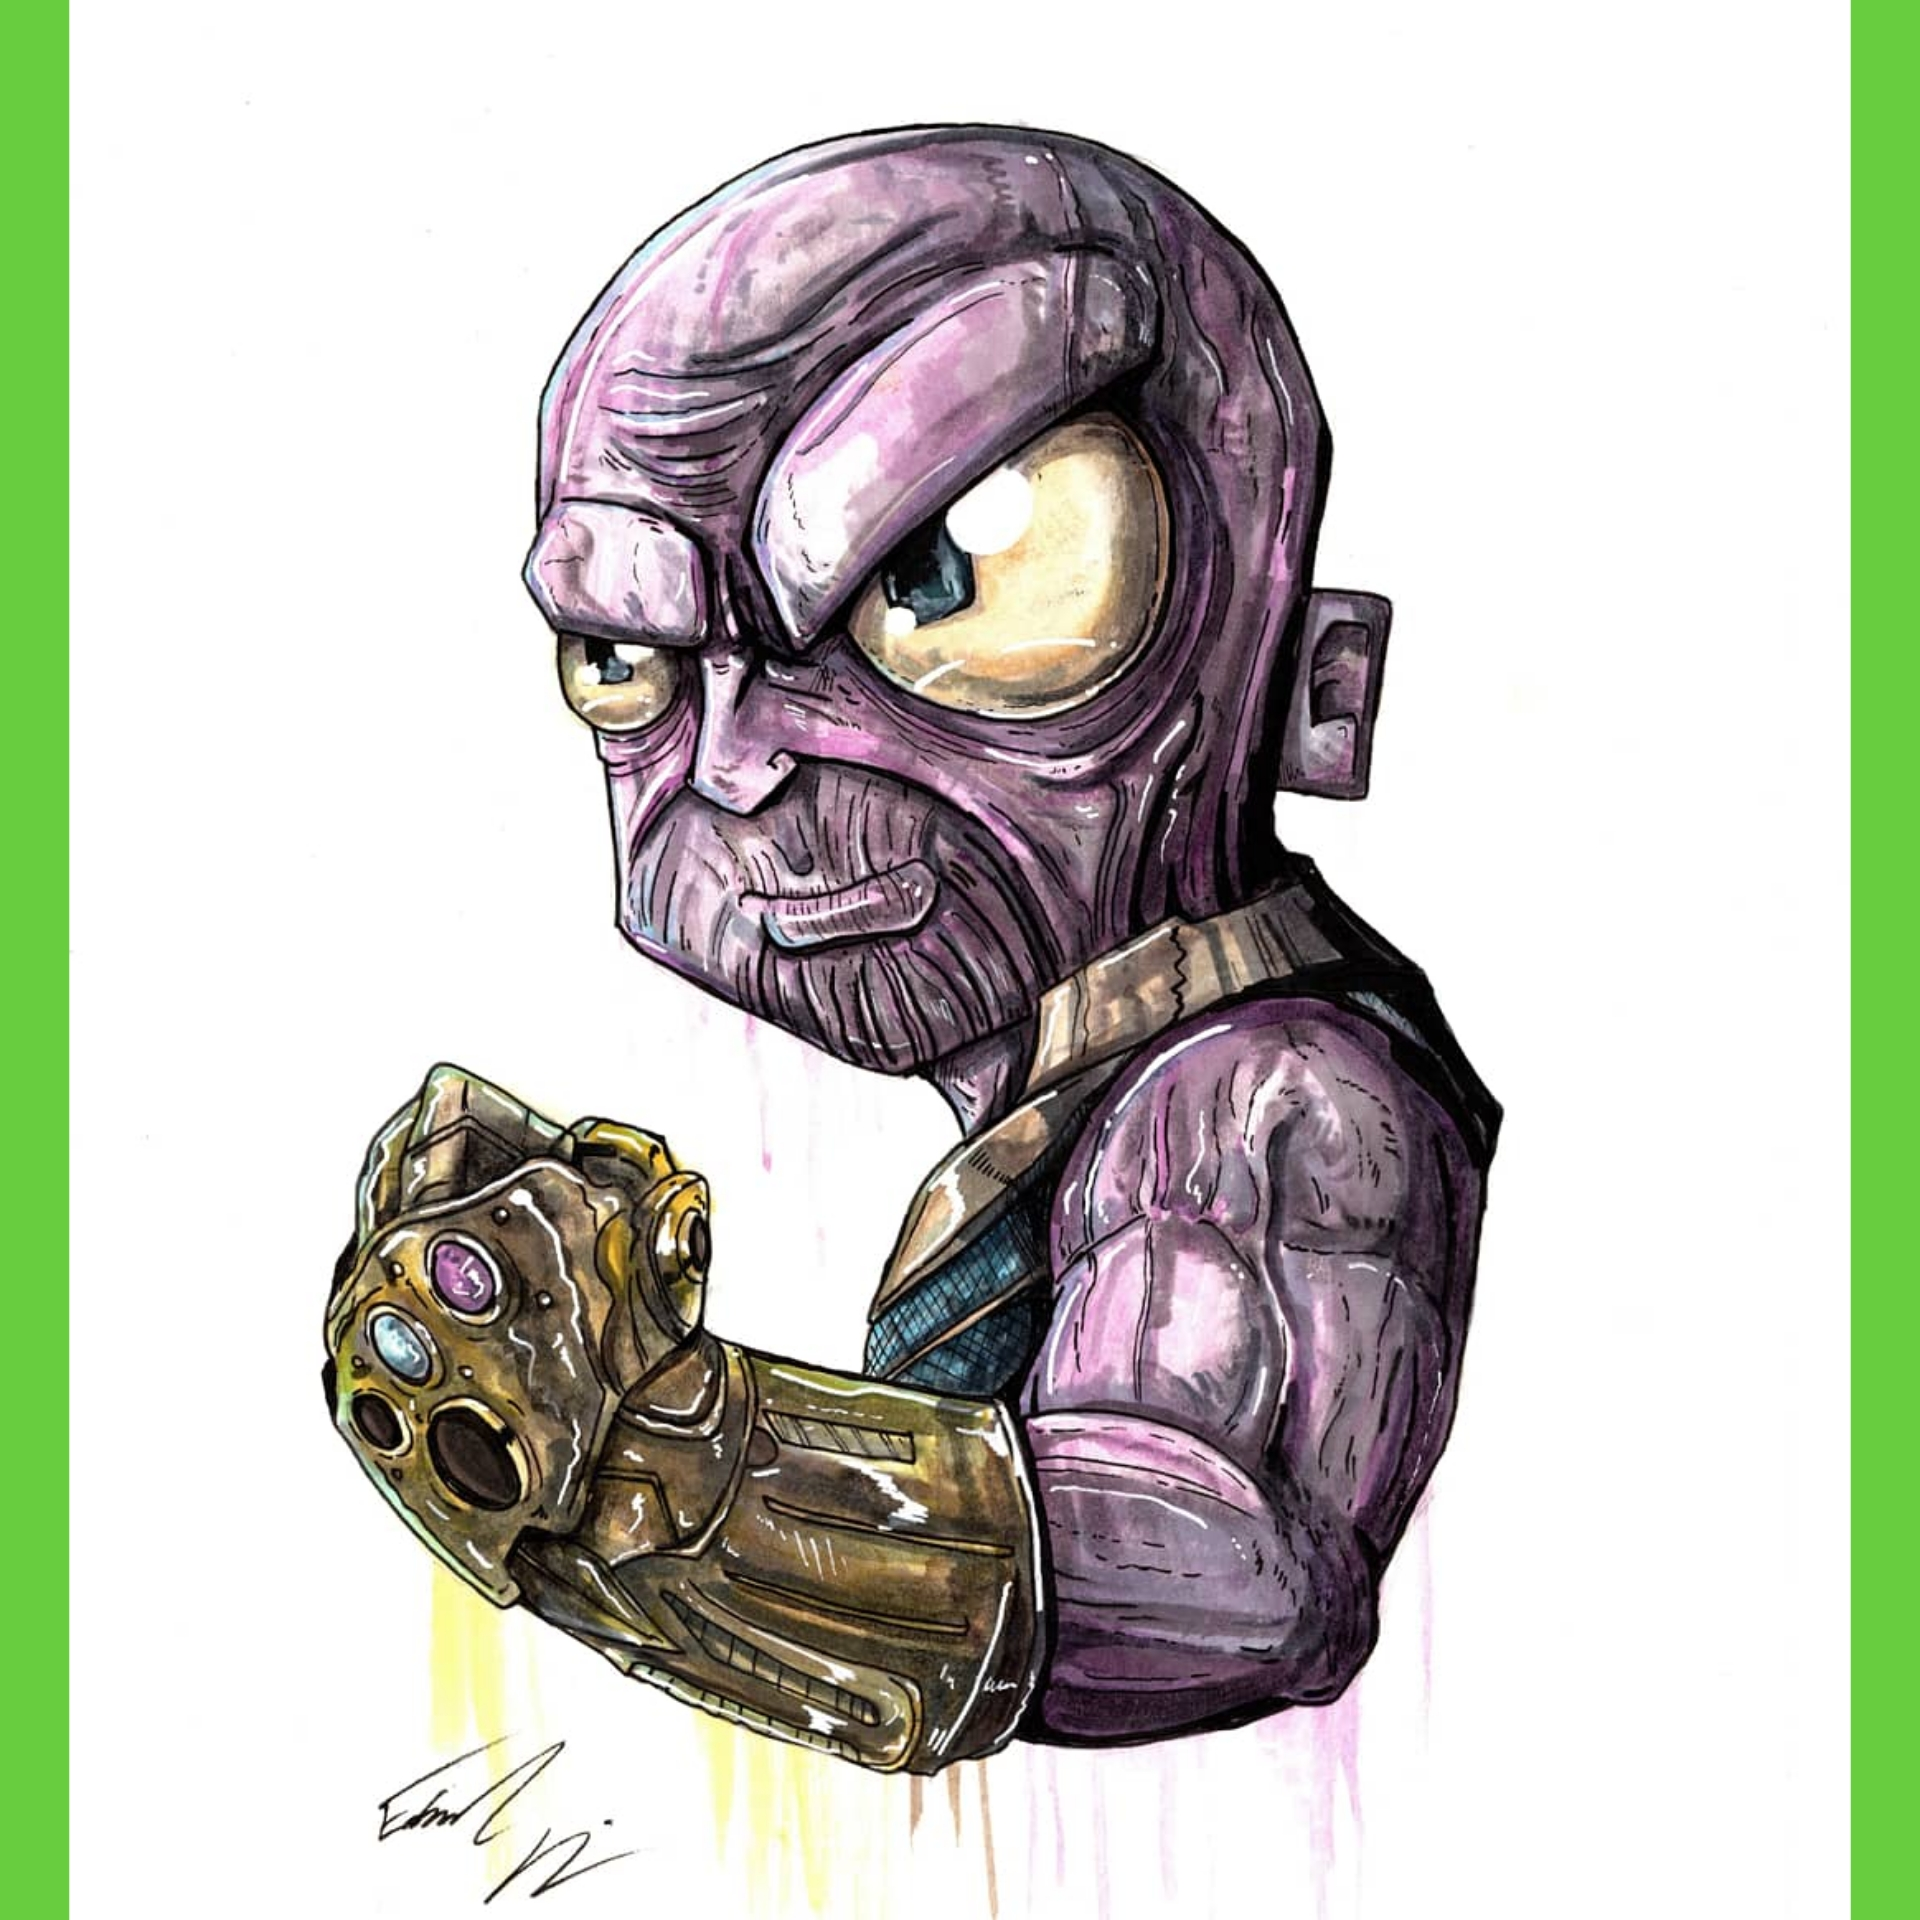 dbf8030f0c2 Thanos print · Taco Boy Designs · Online Store Powered by Storenvy